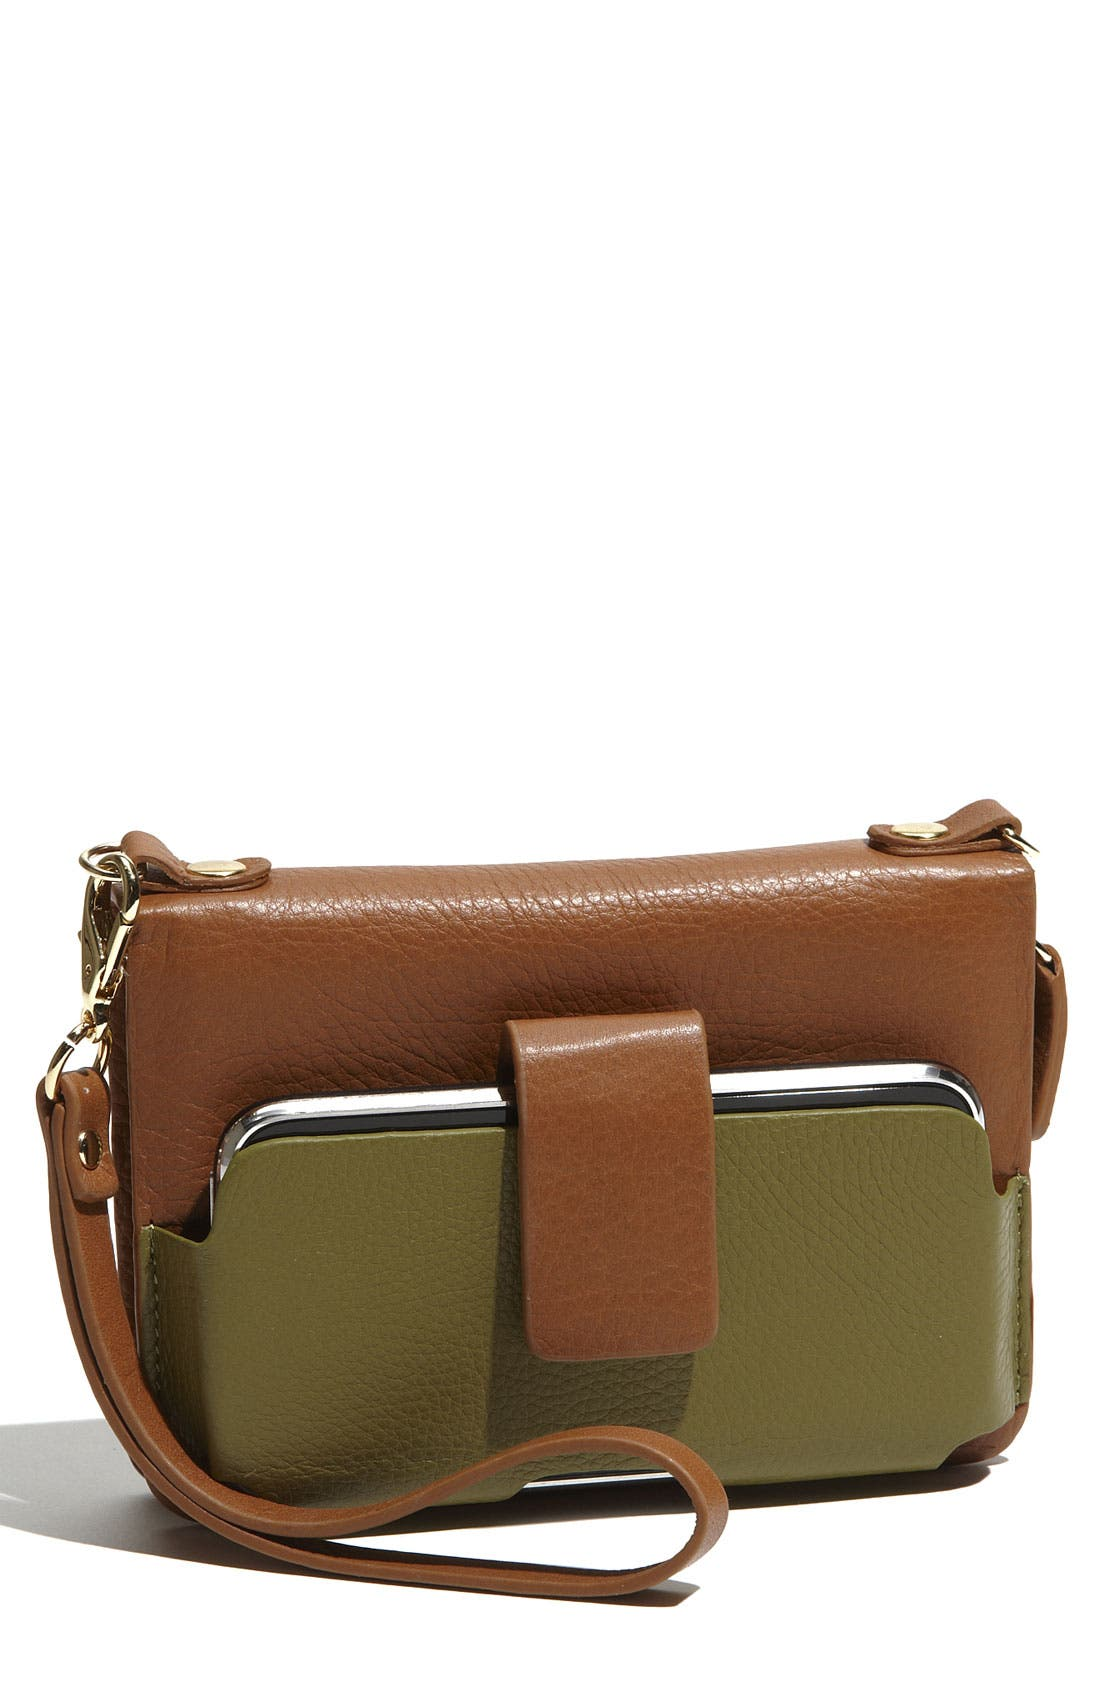 Main Image - Case-Mate® 'Kayla' Wristlet & Smartphone Case